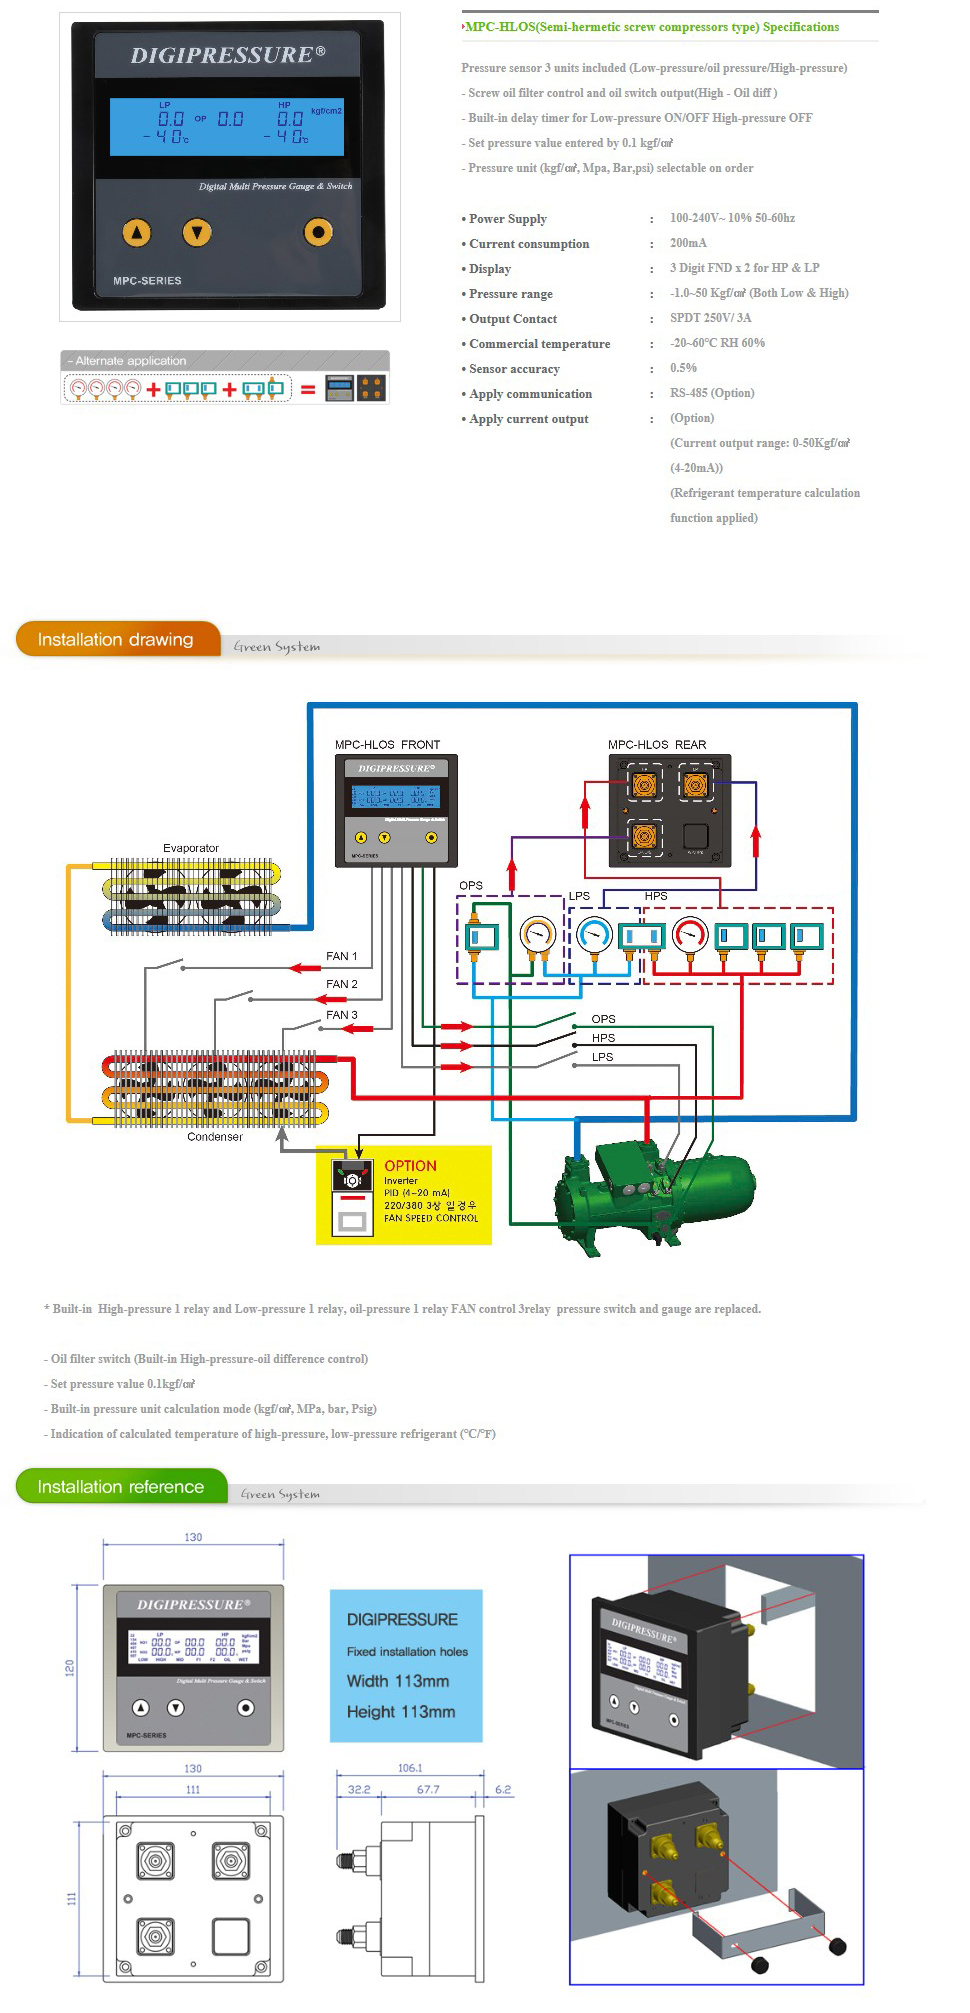 GREEN SYSTEM Semi-hermetic screw compressors type Digital Pressure MPC-HLOS